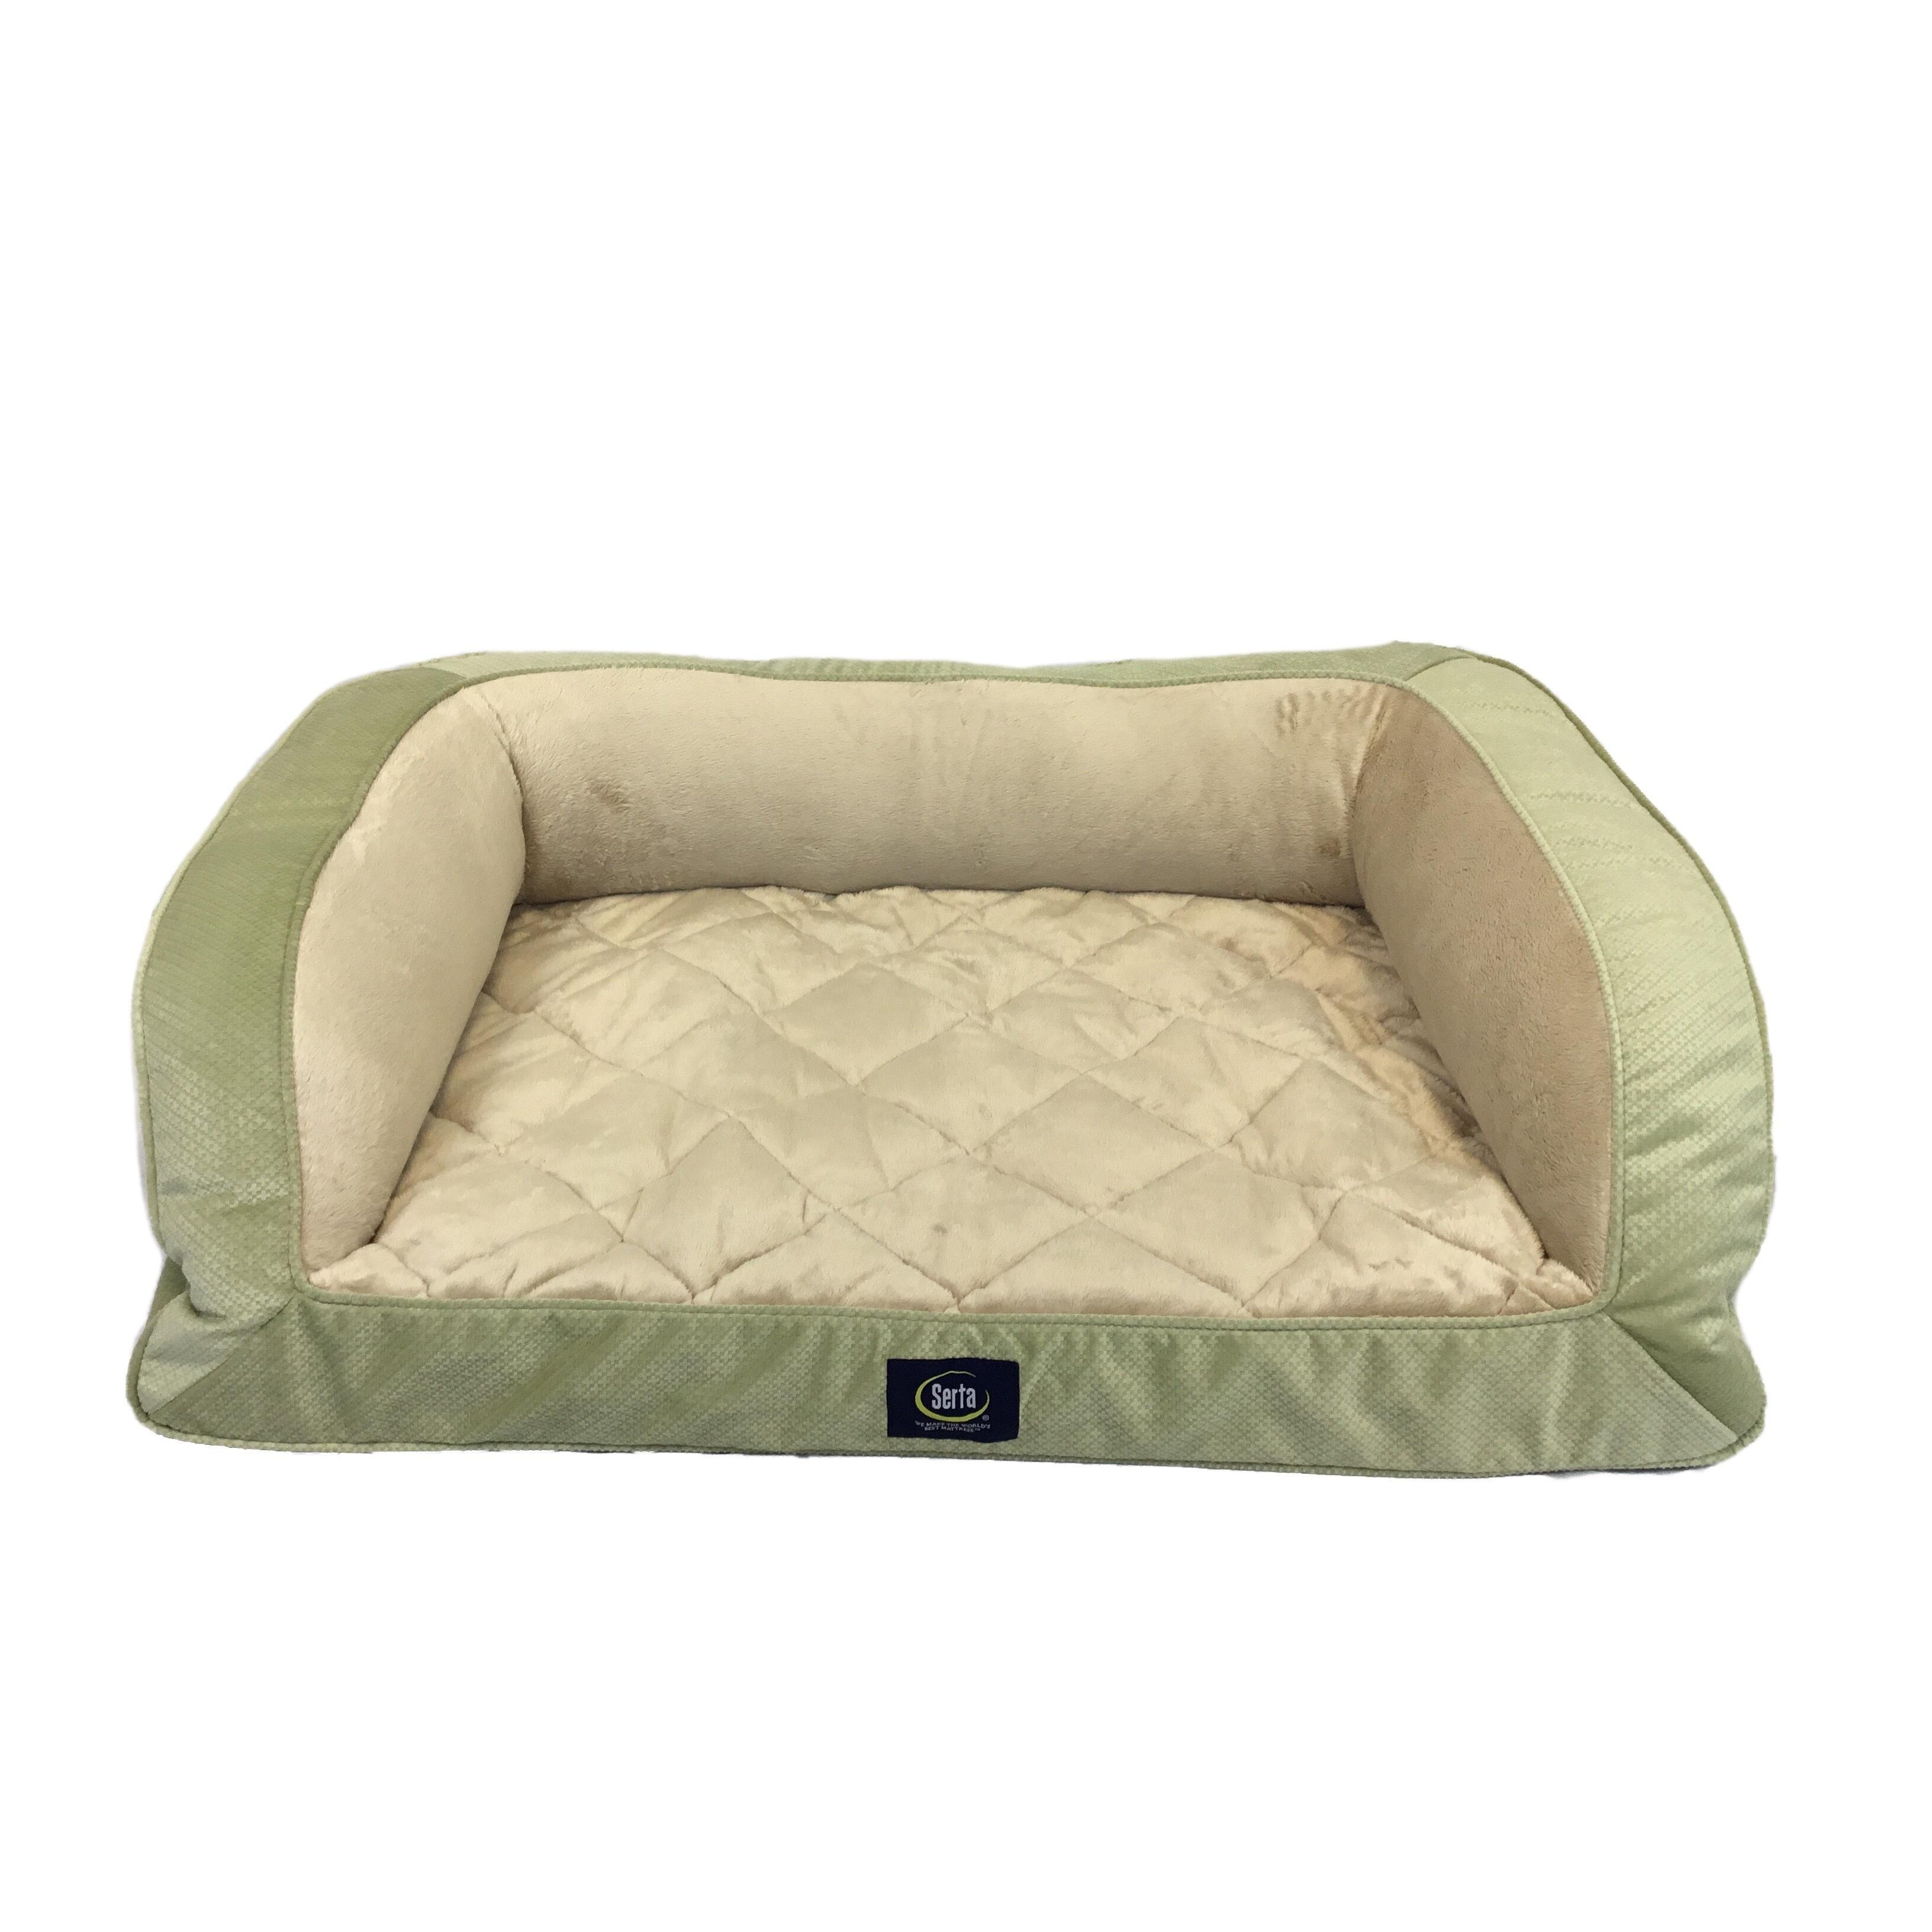 Serta Perfect Sleeper Luxury Sofa Pet Bed Review Home Decor